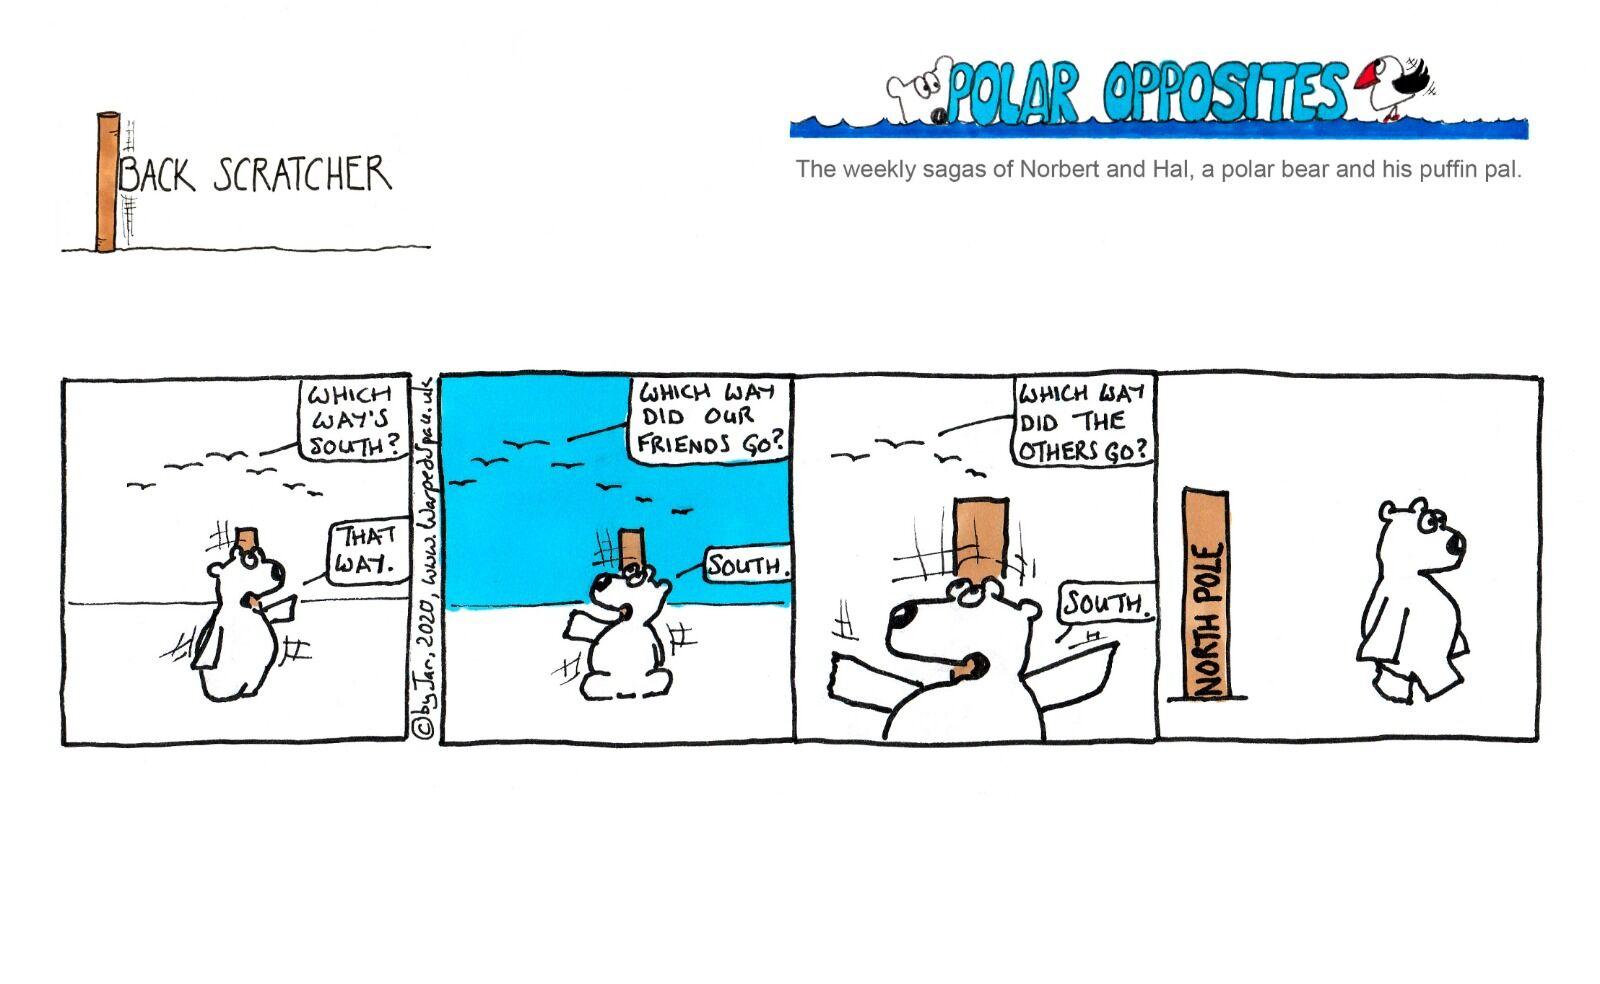 Week 41 - Back Scratcher